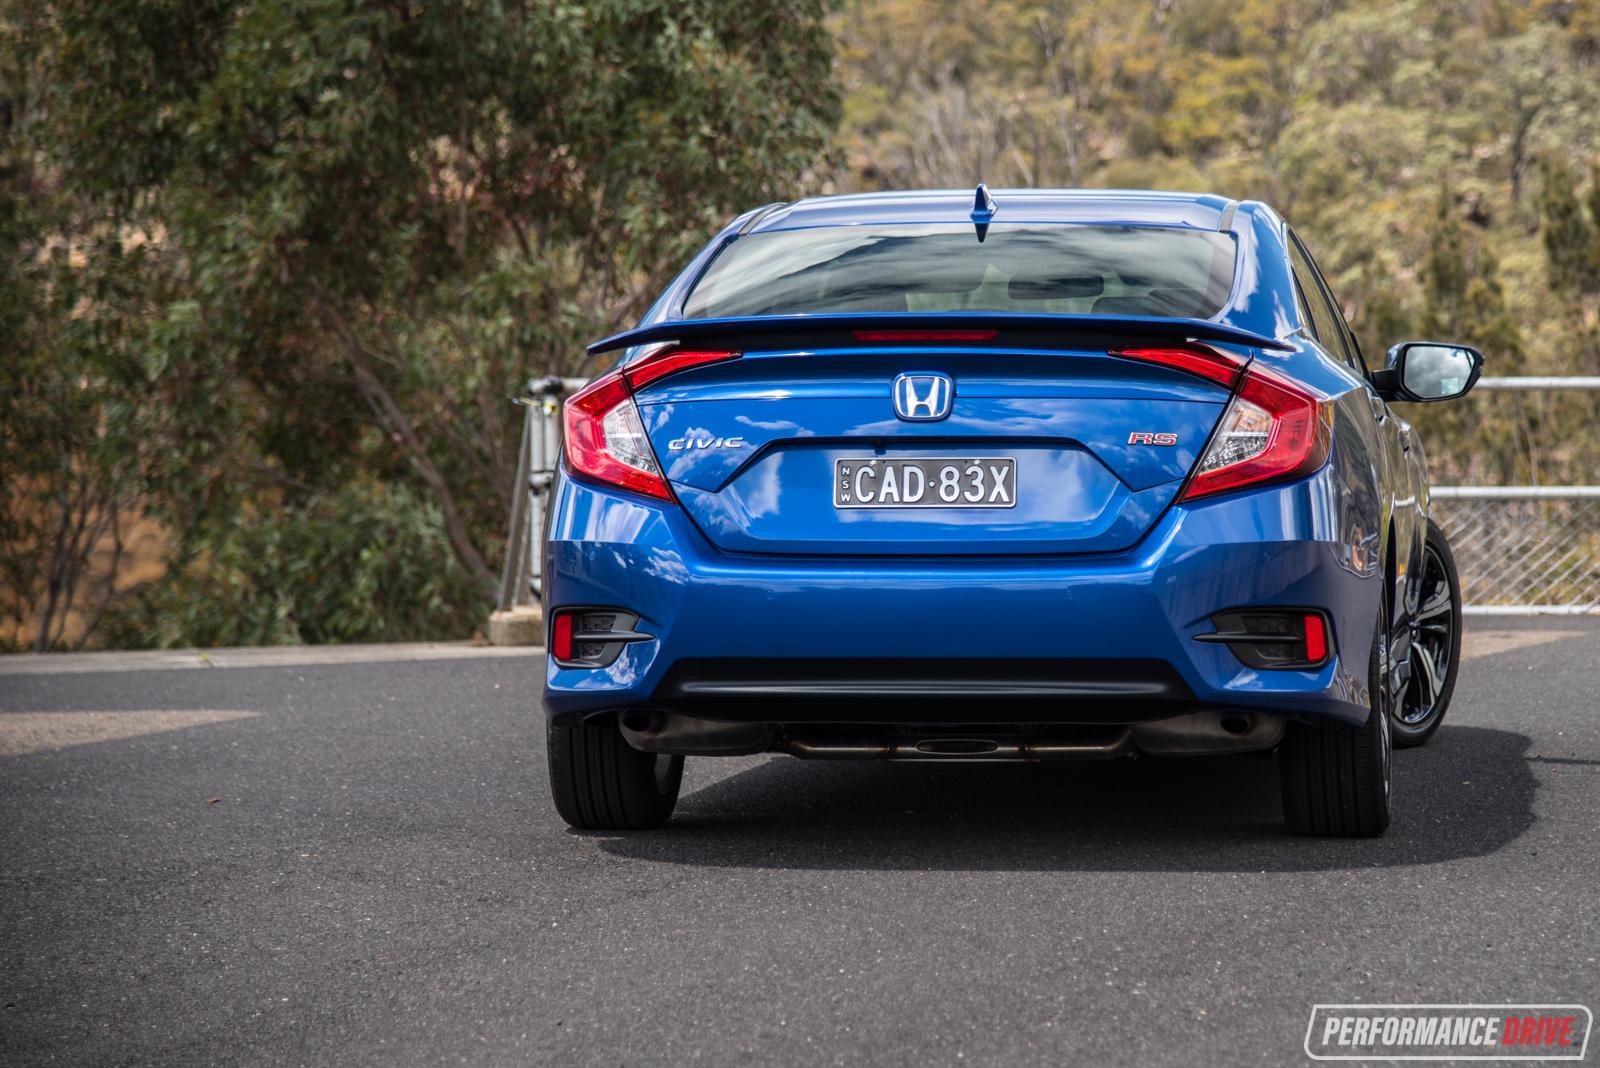 2016 Honda Civic RS turbo review (video) | PerformanceDrive